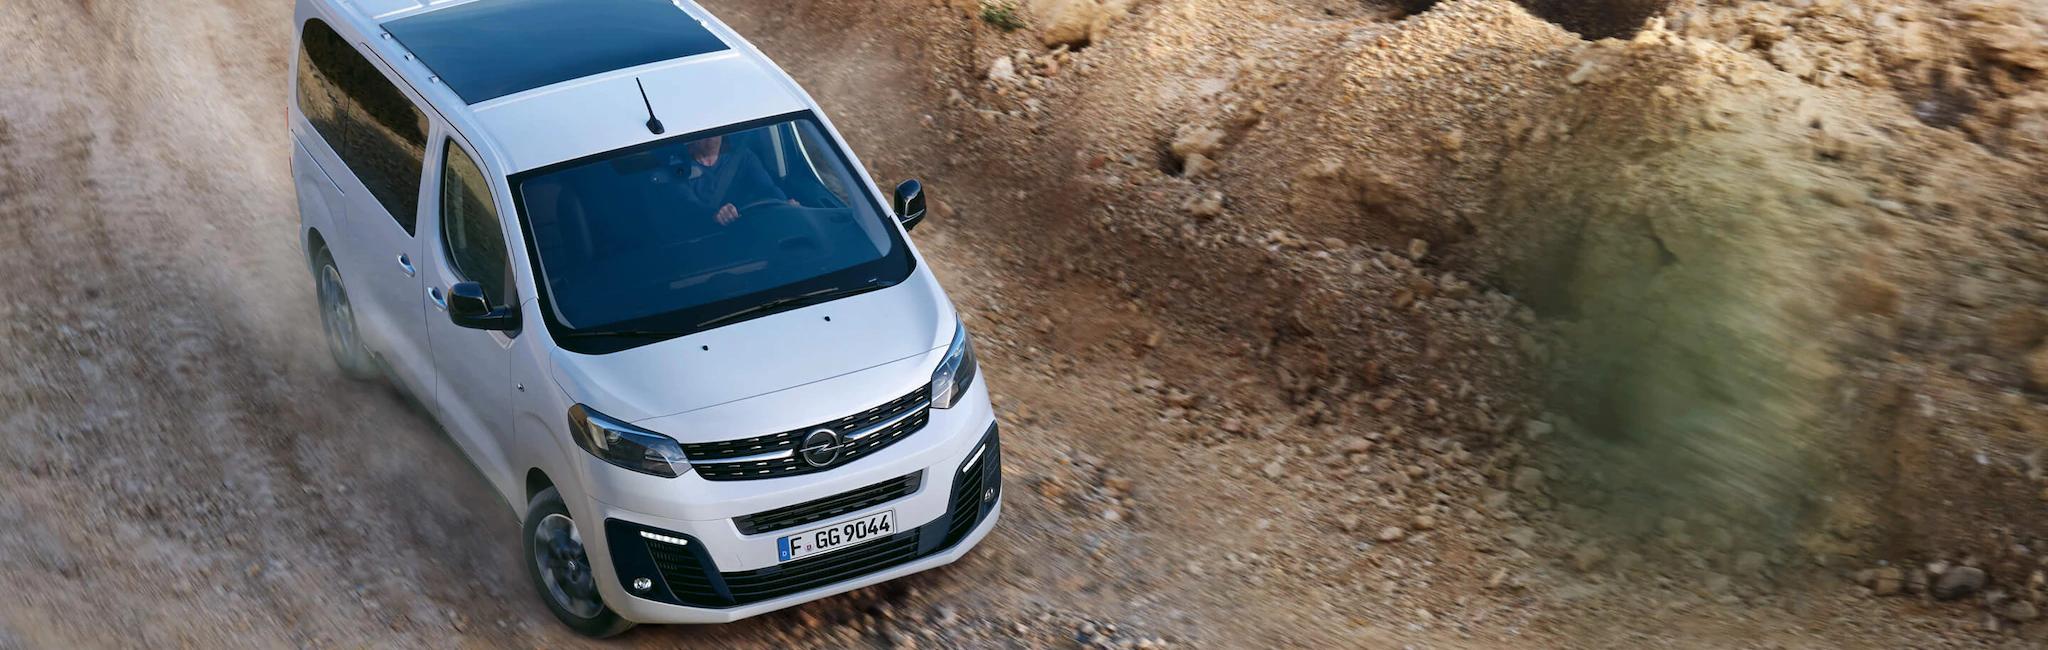 Opel_zafira_life_exterior_driving_21x9_zal195_e01_006